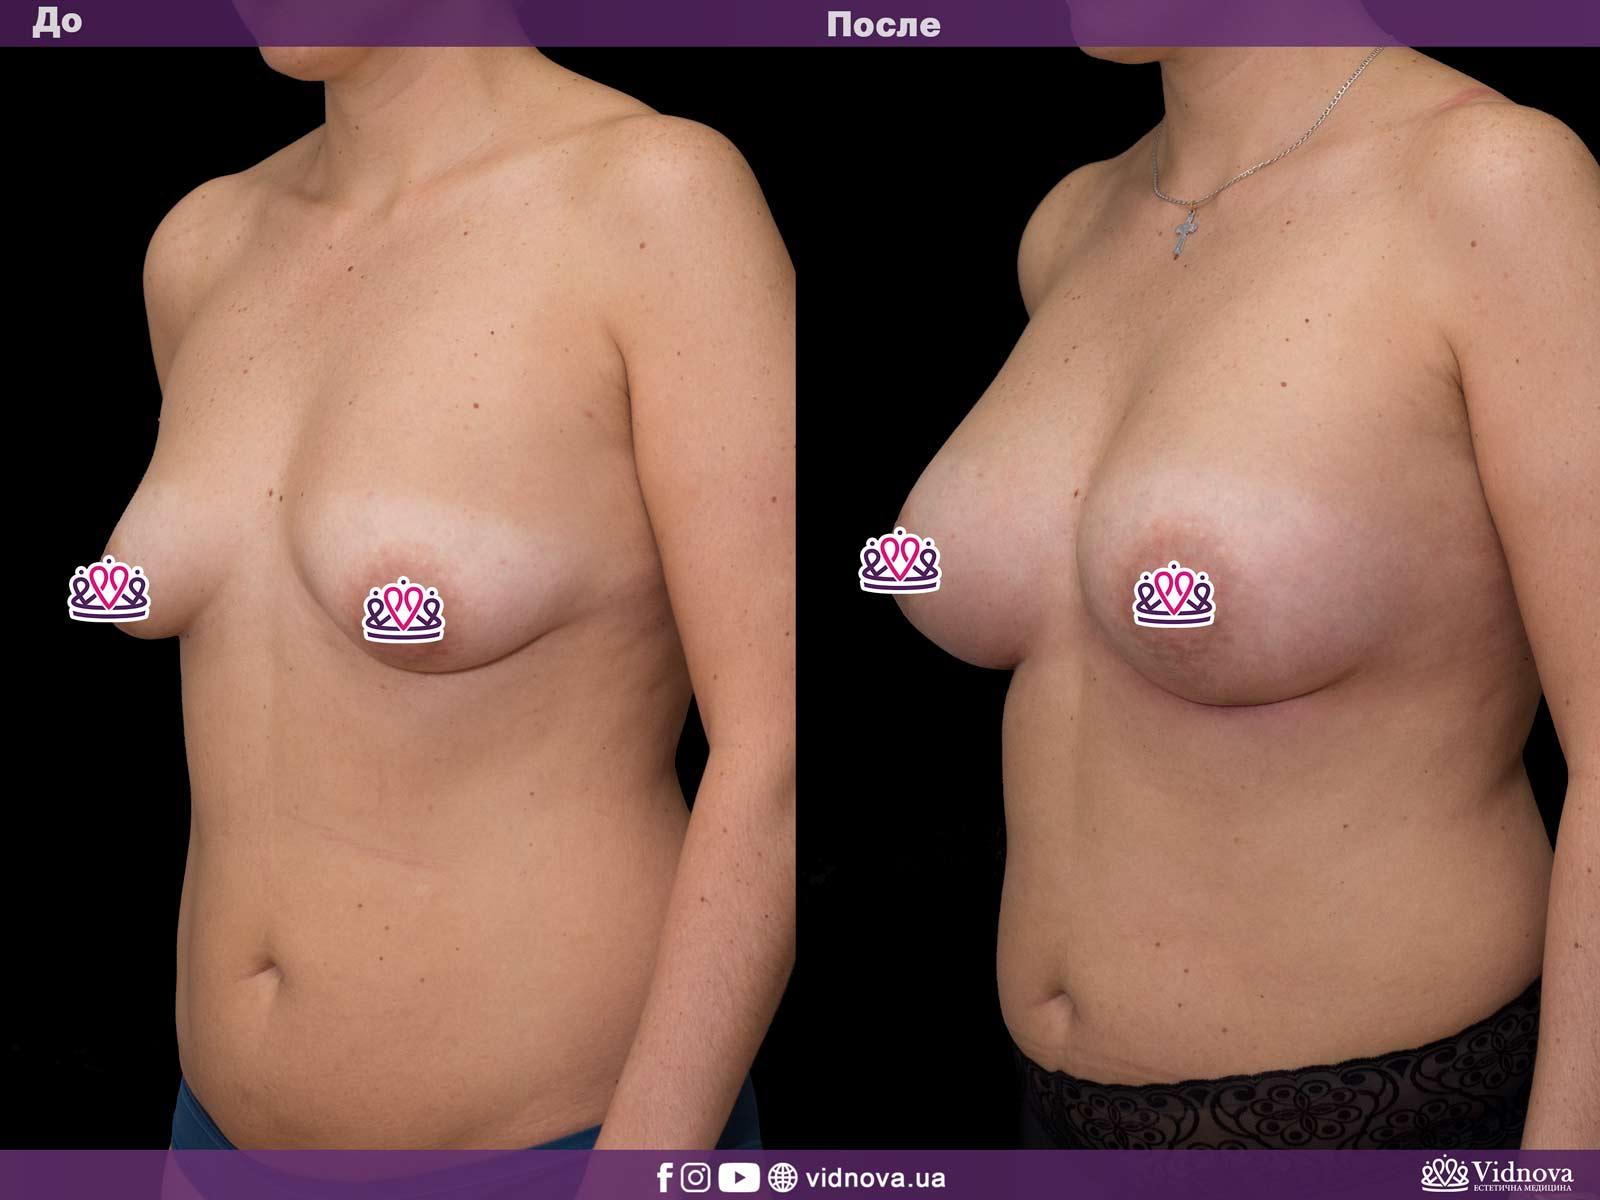 Увеличение груди: Фото ДО и ПОСЛЕ - Пример №37-2 - Клиника Vidnova